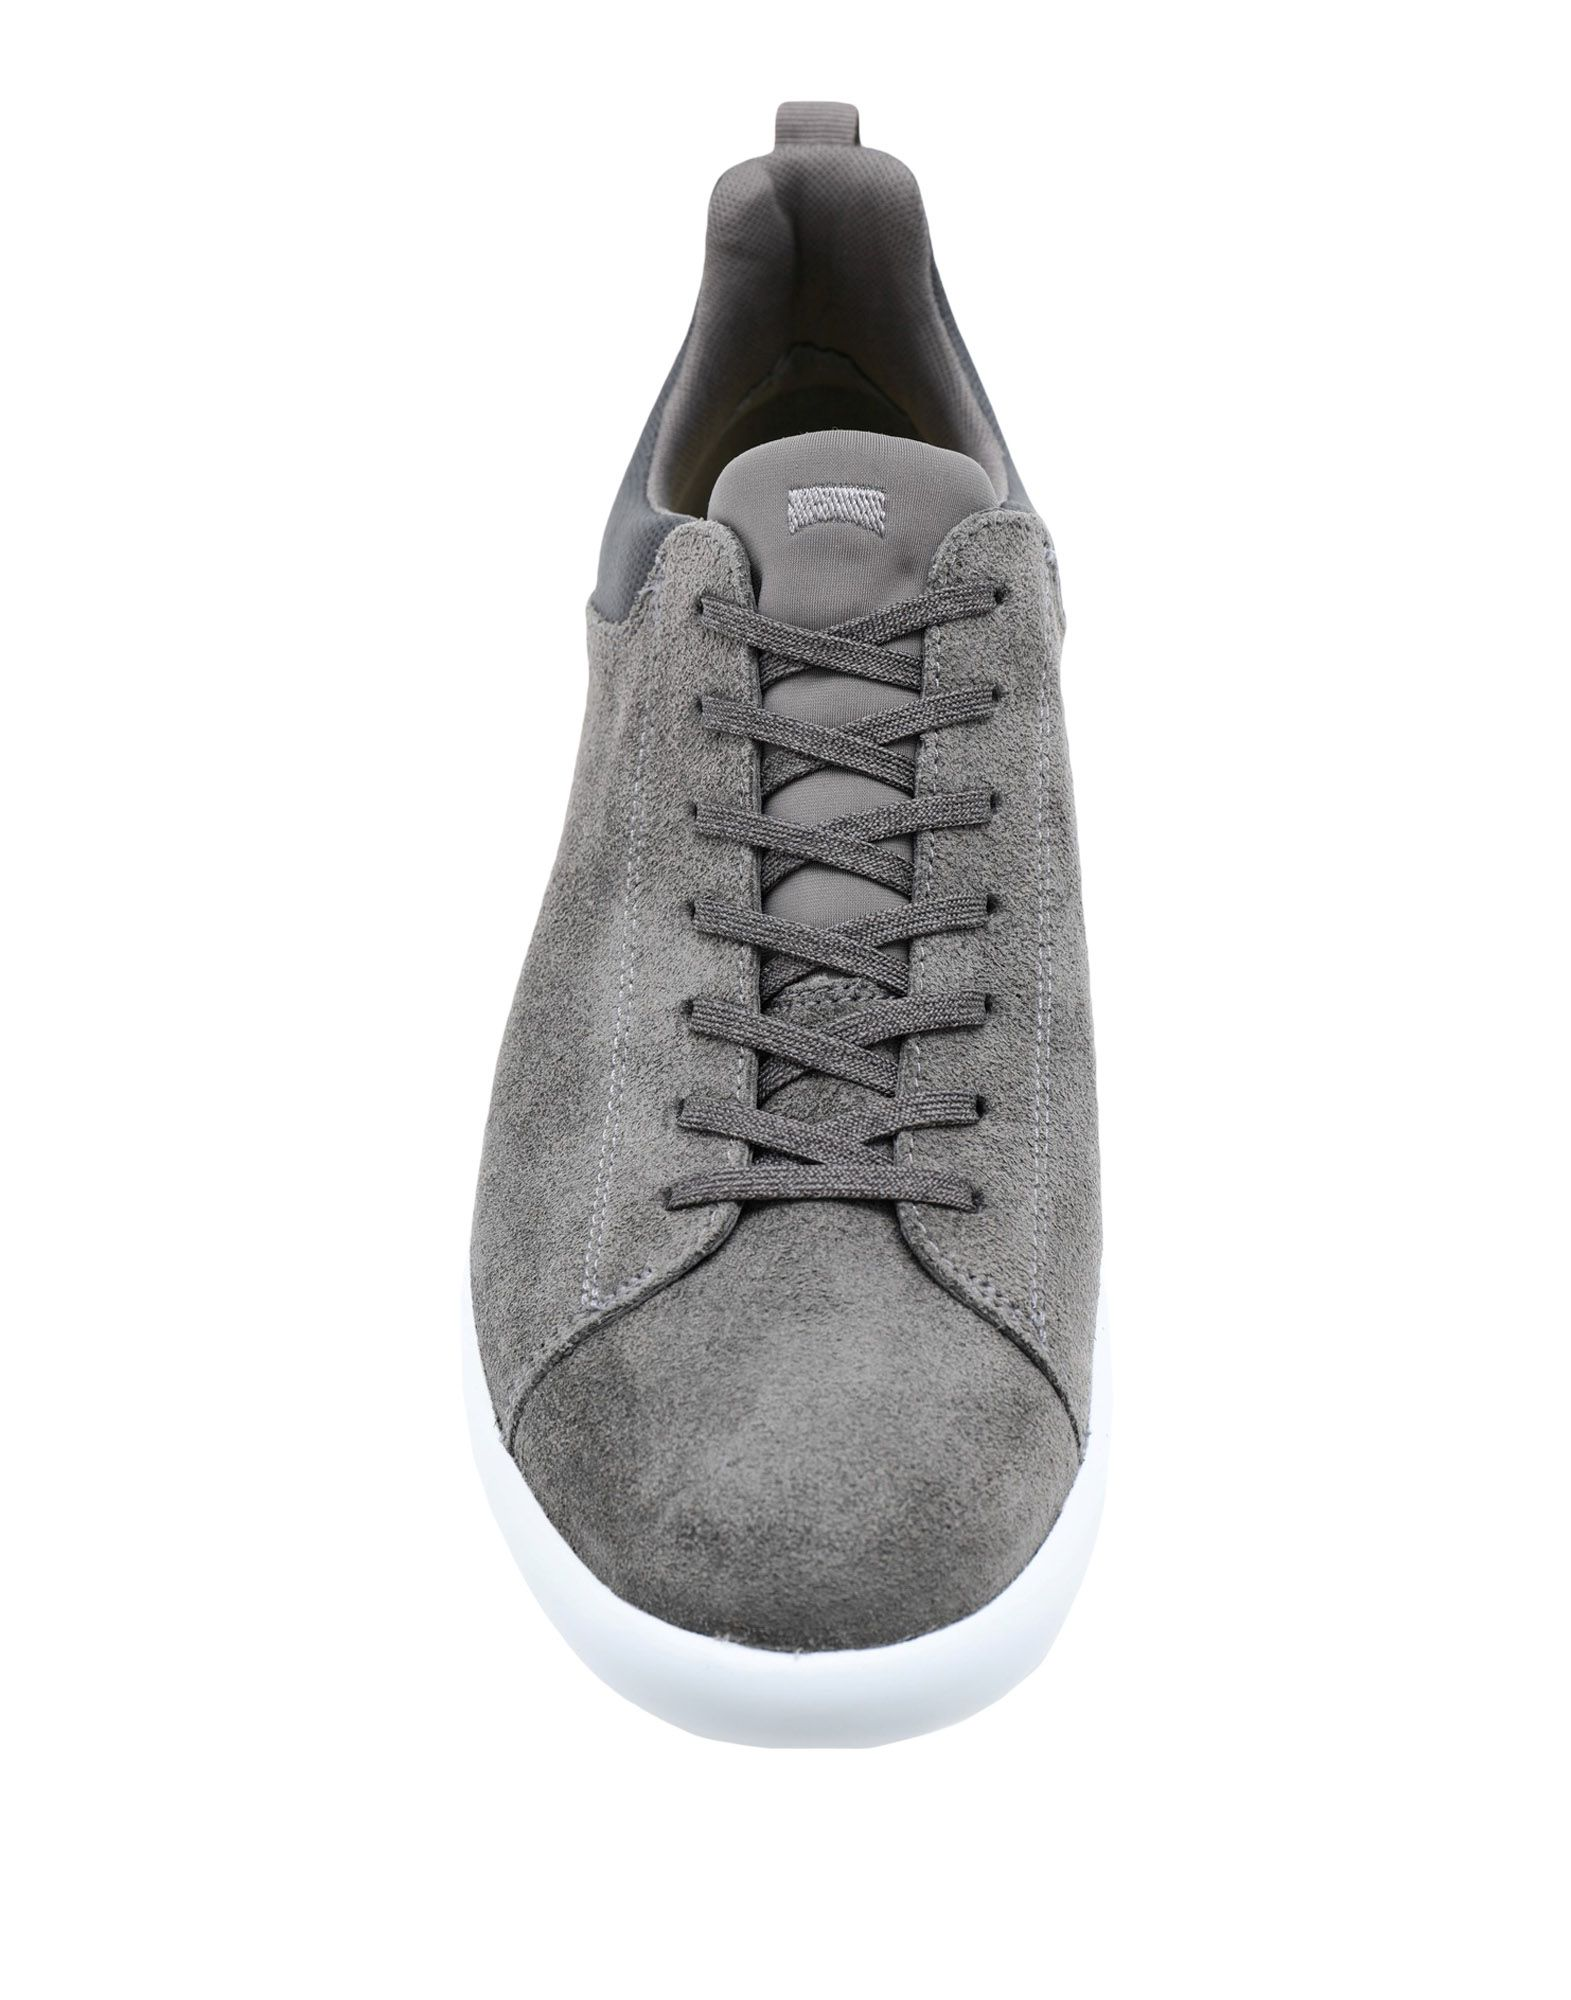 Camper Camper Camper Sneakers - Men Camper Sneakers online on  Australia - 11555304LI e0a739